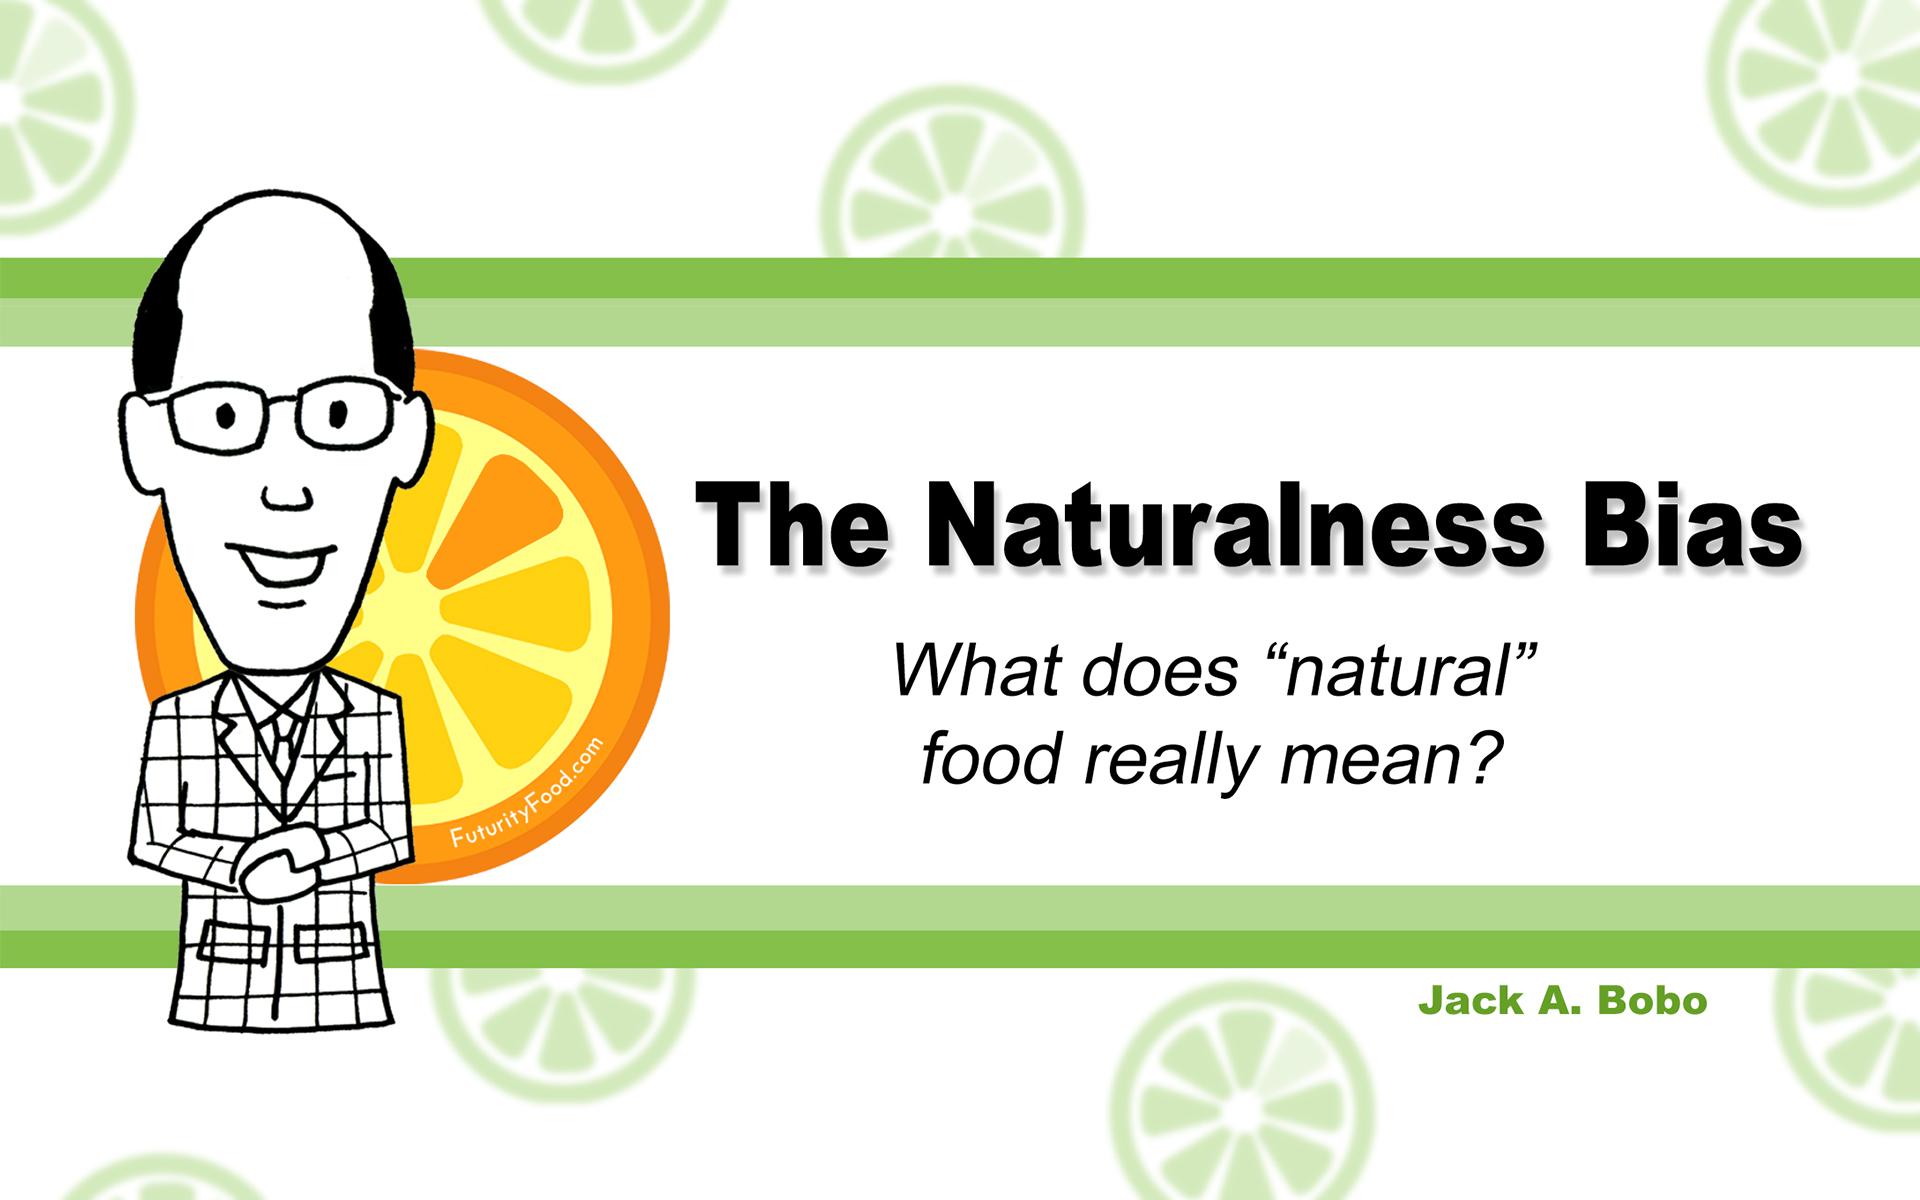 The Naturalness Bias